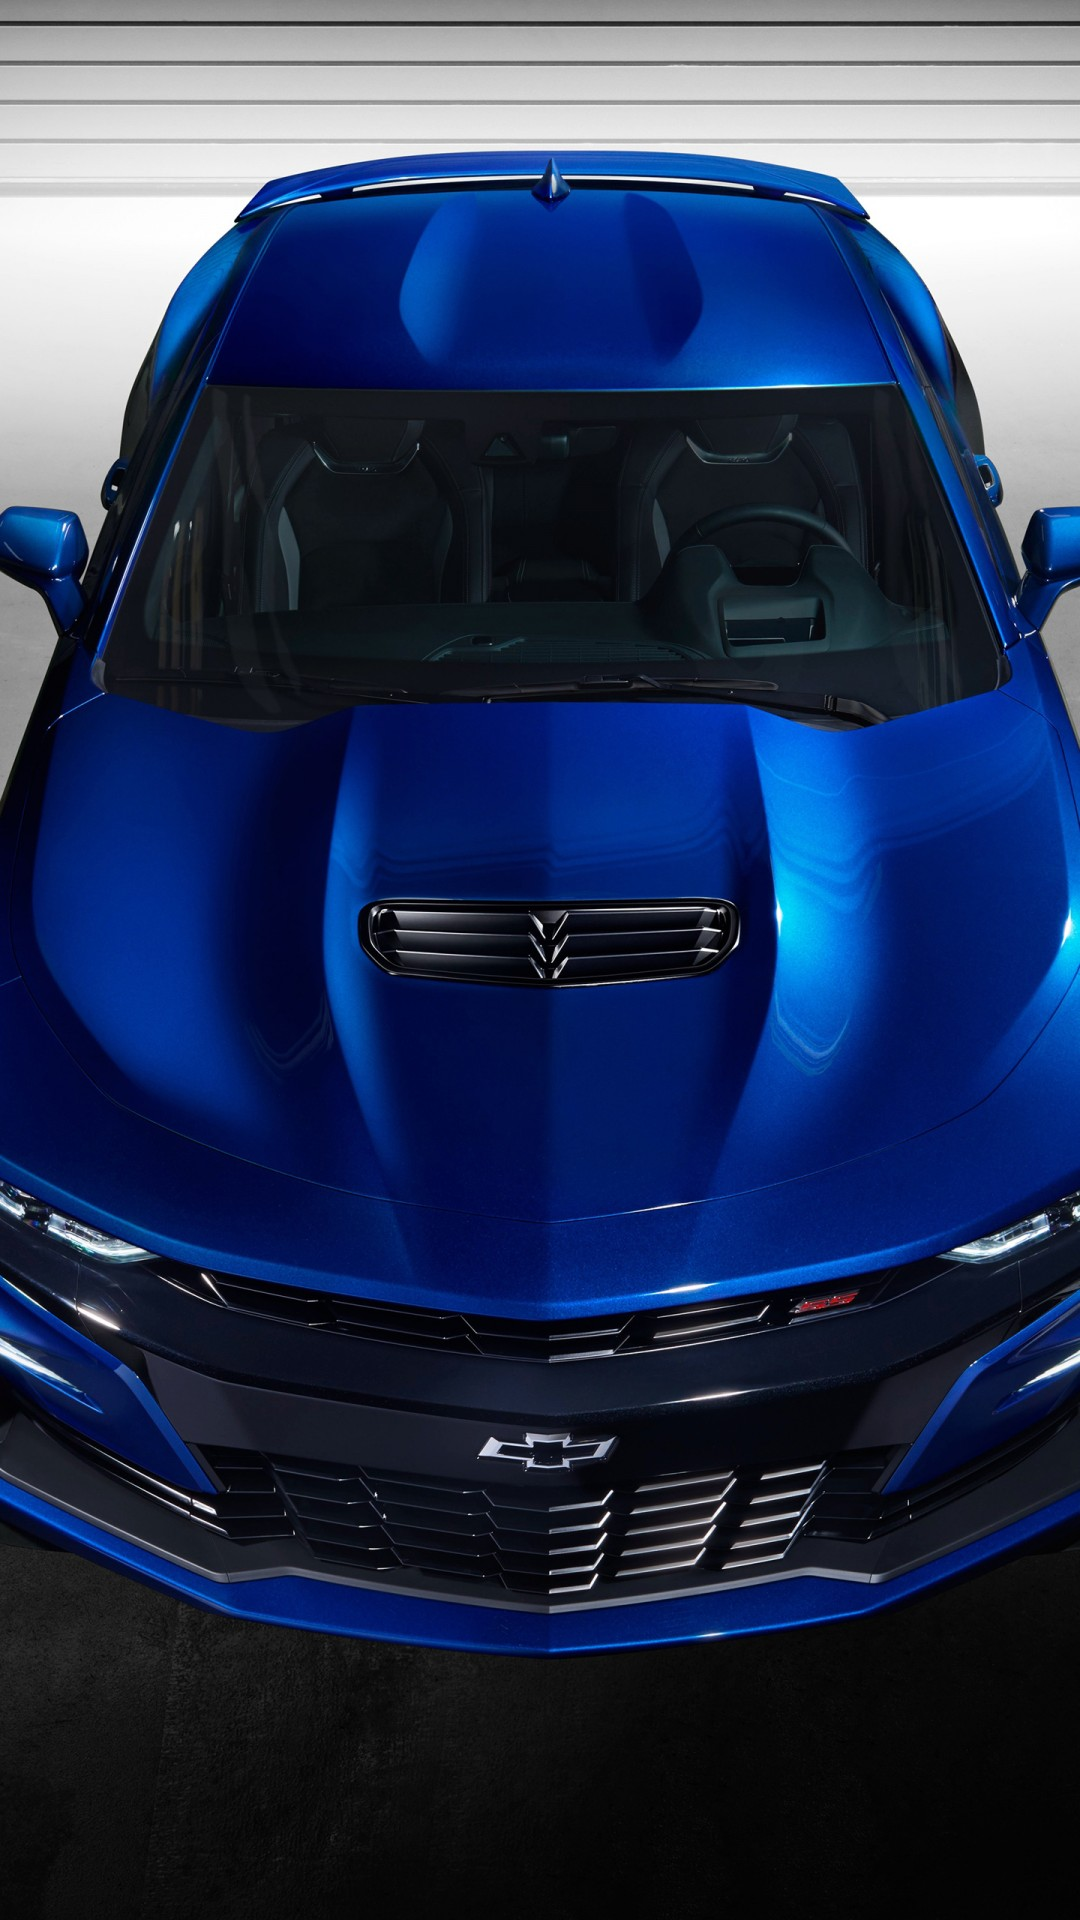 2019 Chevrolet Camaro SS 4K Car Wallpaper - iPhone 6 / 6S Plus